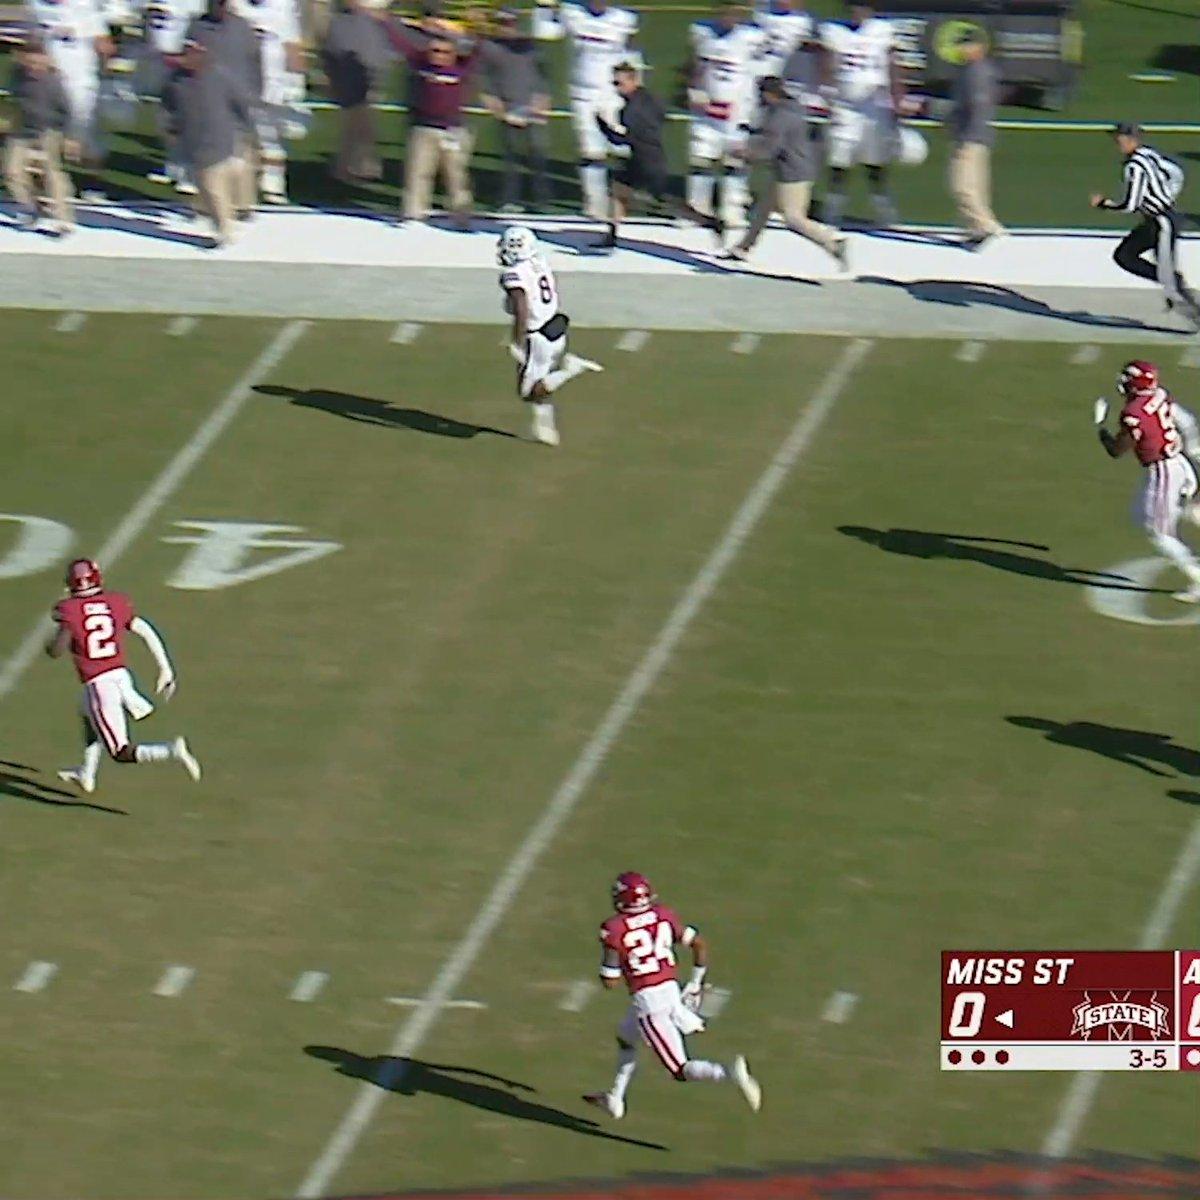 .@H_Kylin: 234 rush yards  @NickGibbo837: 129 rush yards   @HailStateFB ran for 4️⃣6️⃣0️⃣ yards vs. Arkansas — the most rushing yards in an SEC game in program history 🔥 https://t.co/qnkZV3osU0